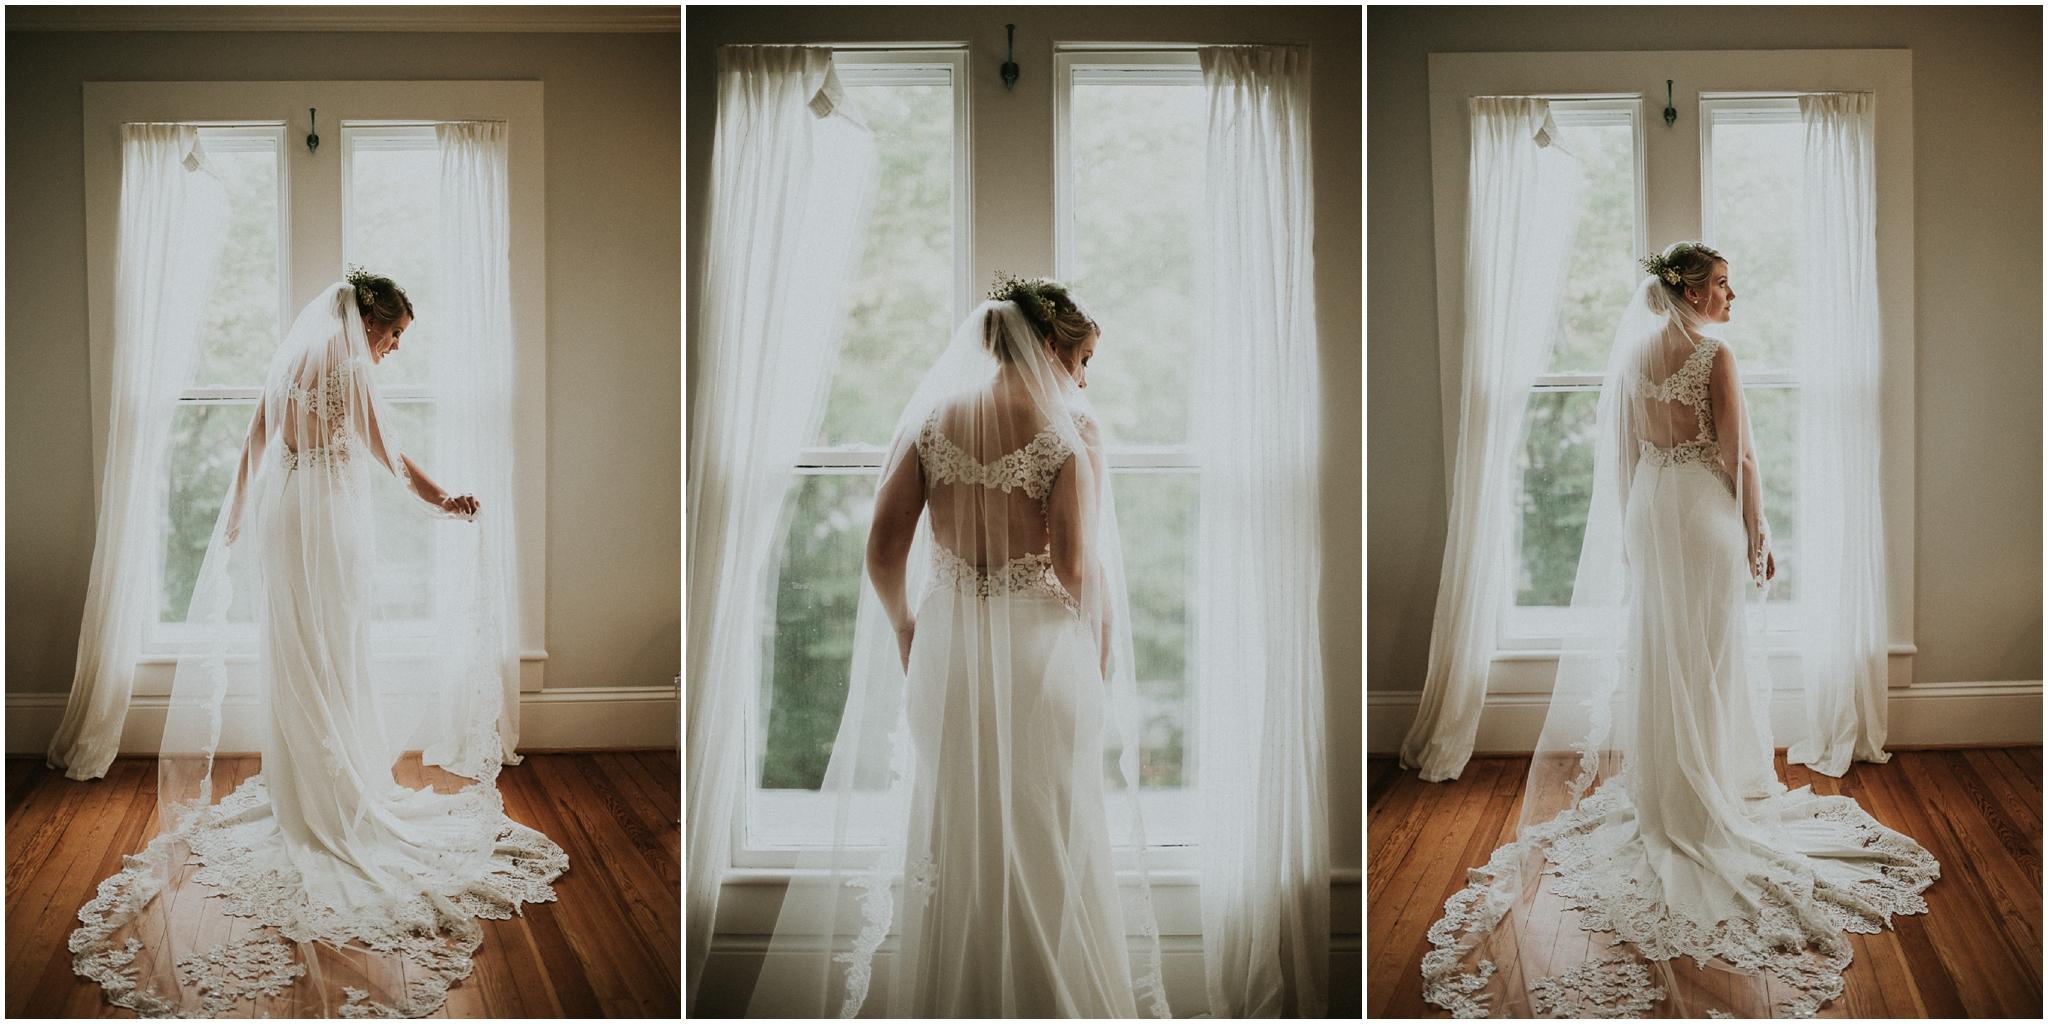 Wedding-photographer-ritchie-hill_0027.jpg